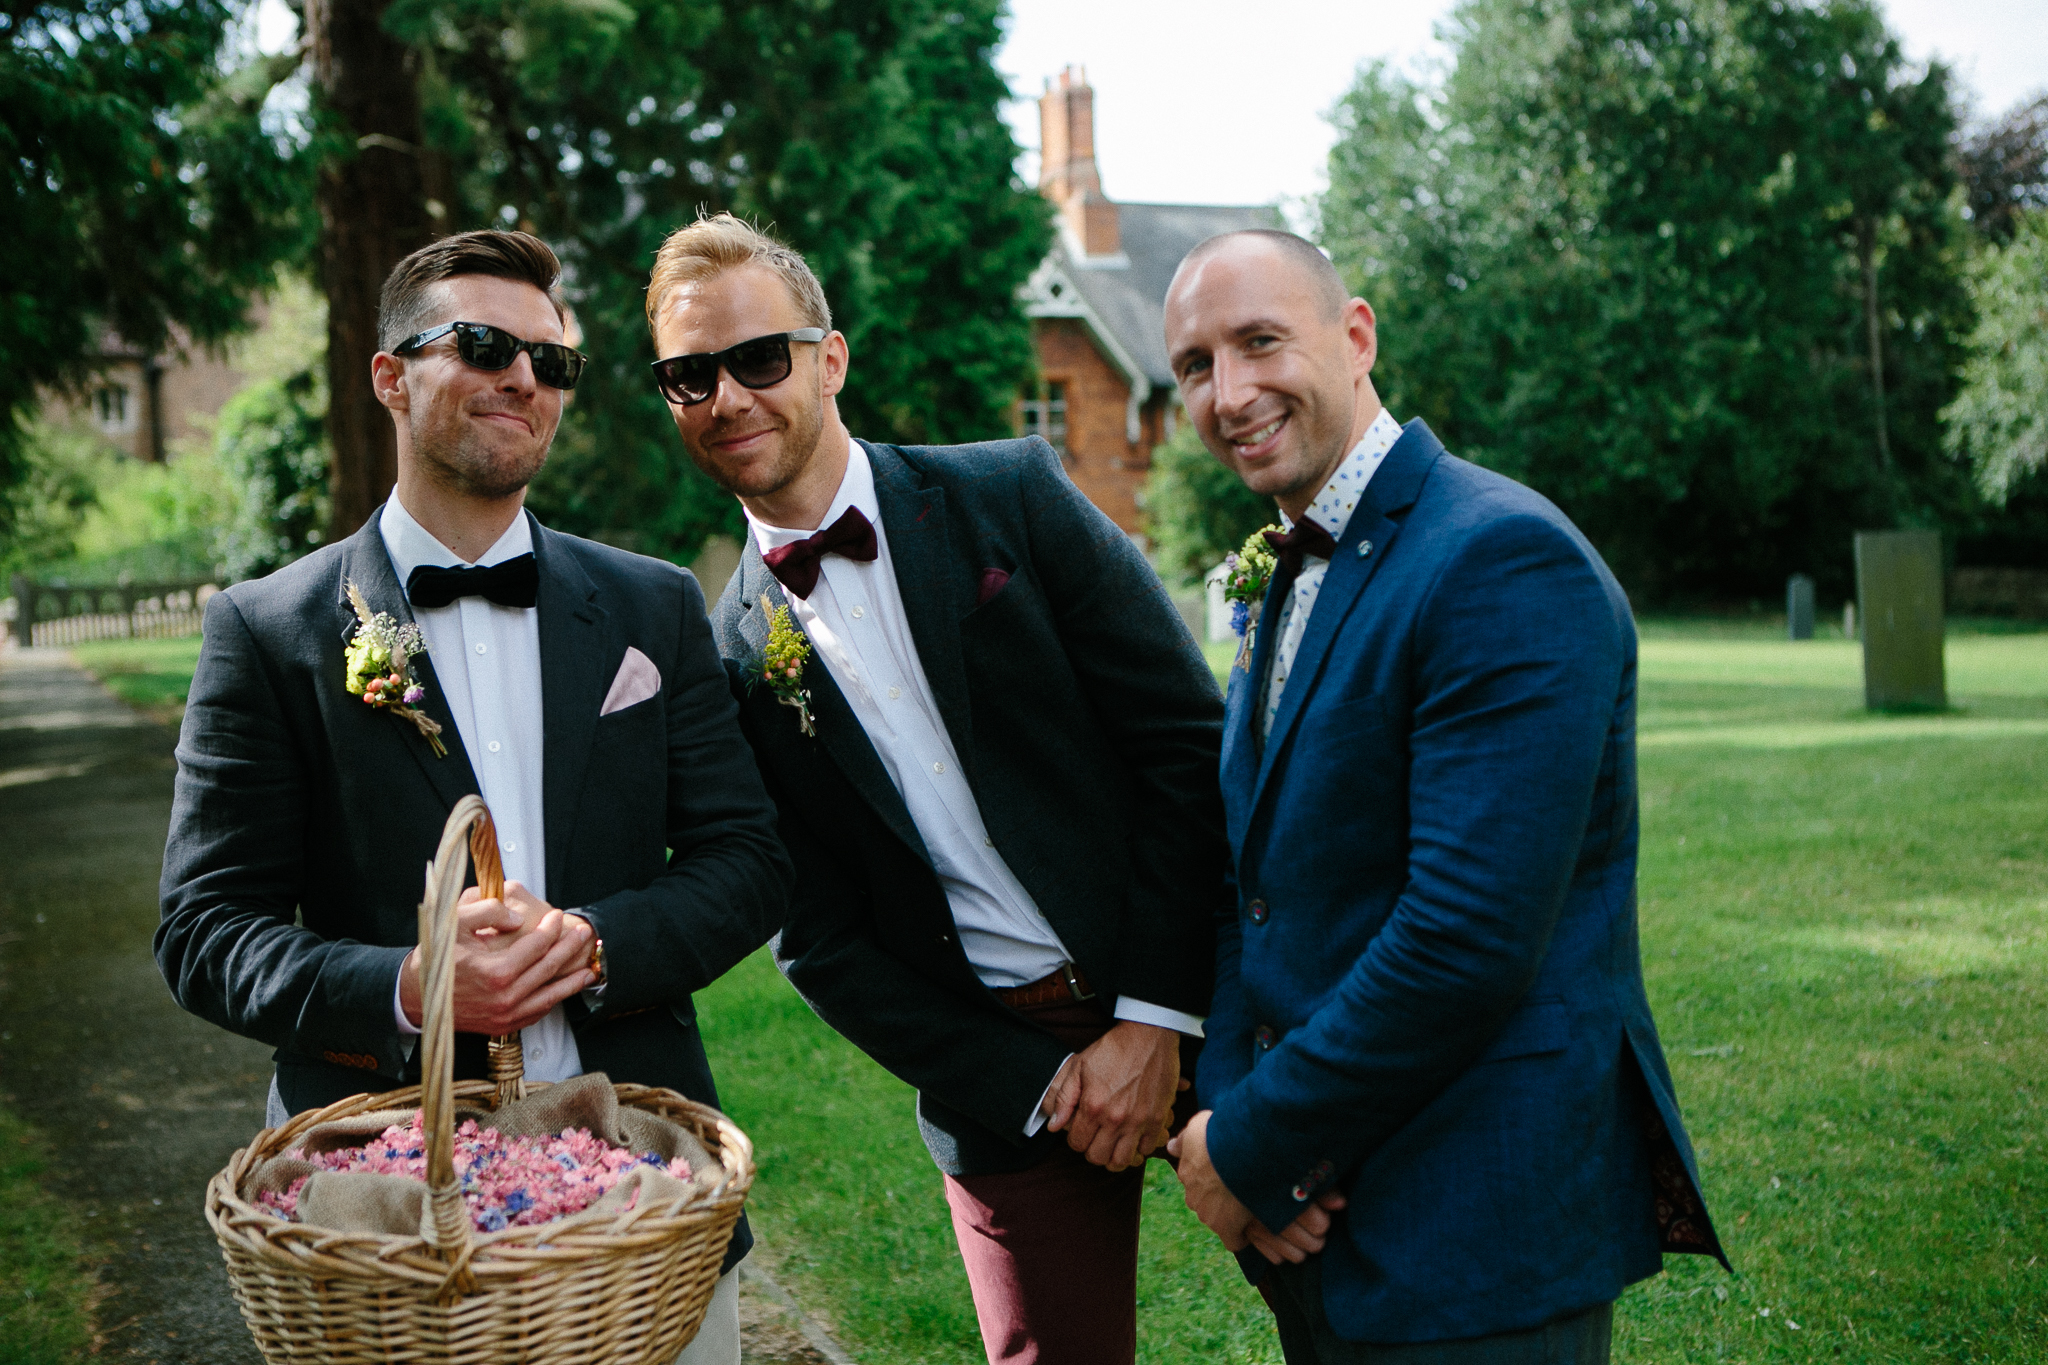 grantham_wedding_photographer-65.jpg